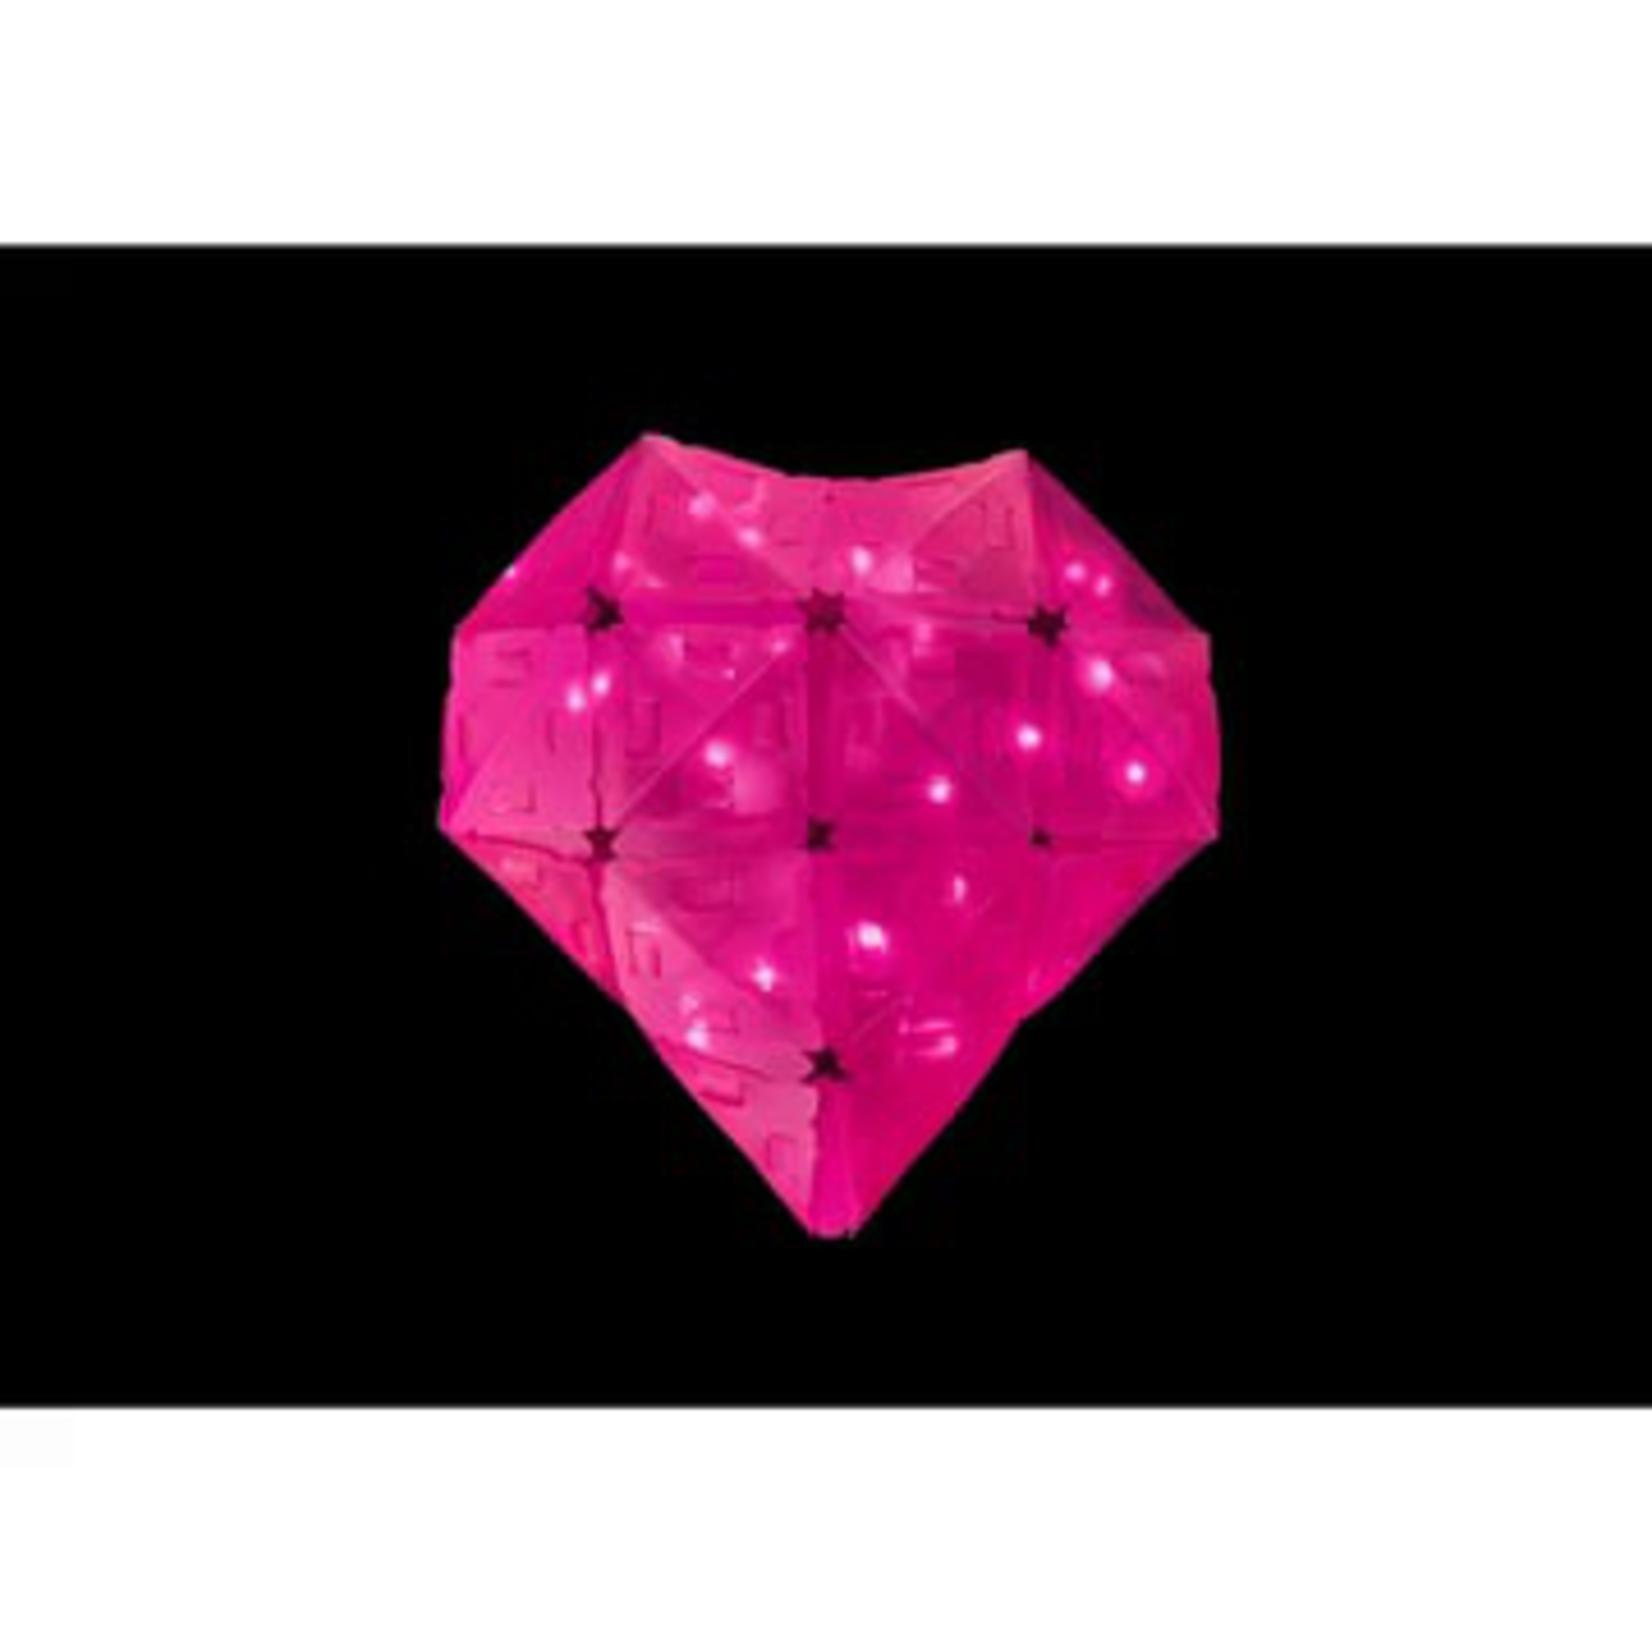 KOSMOS Creatto: Shining Sweetheart & Lovable Stuff